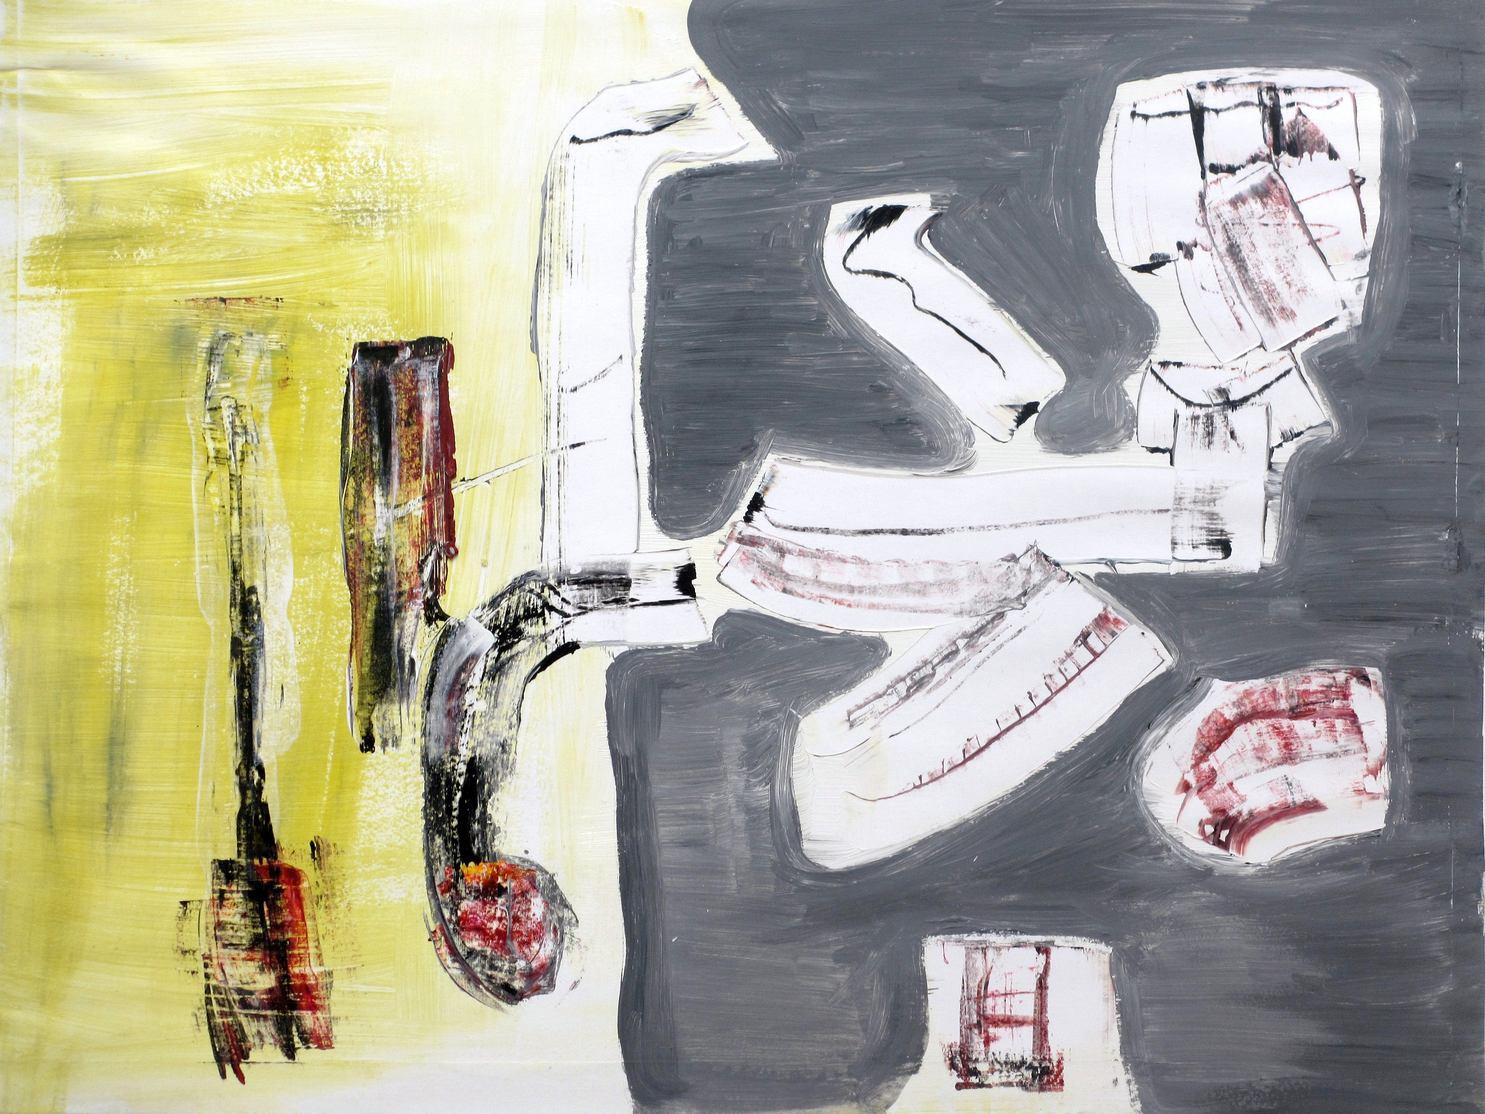 """Strange machine"". Gouache, acrylic and gesso on paper. 65 x 50 cm. 2012"